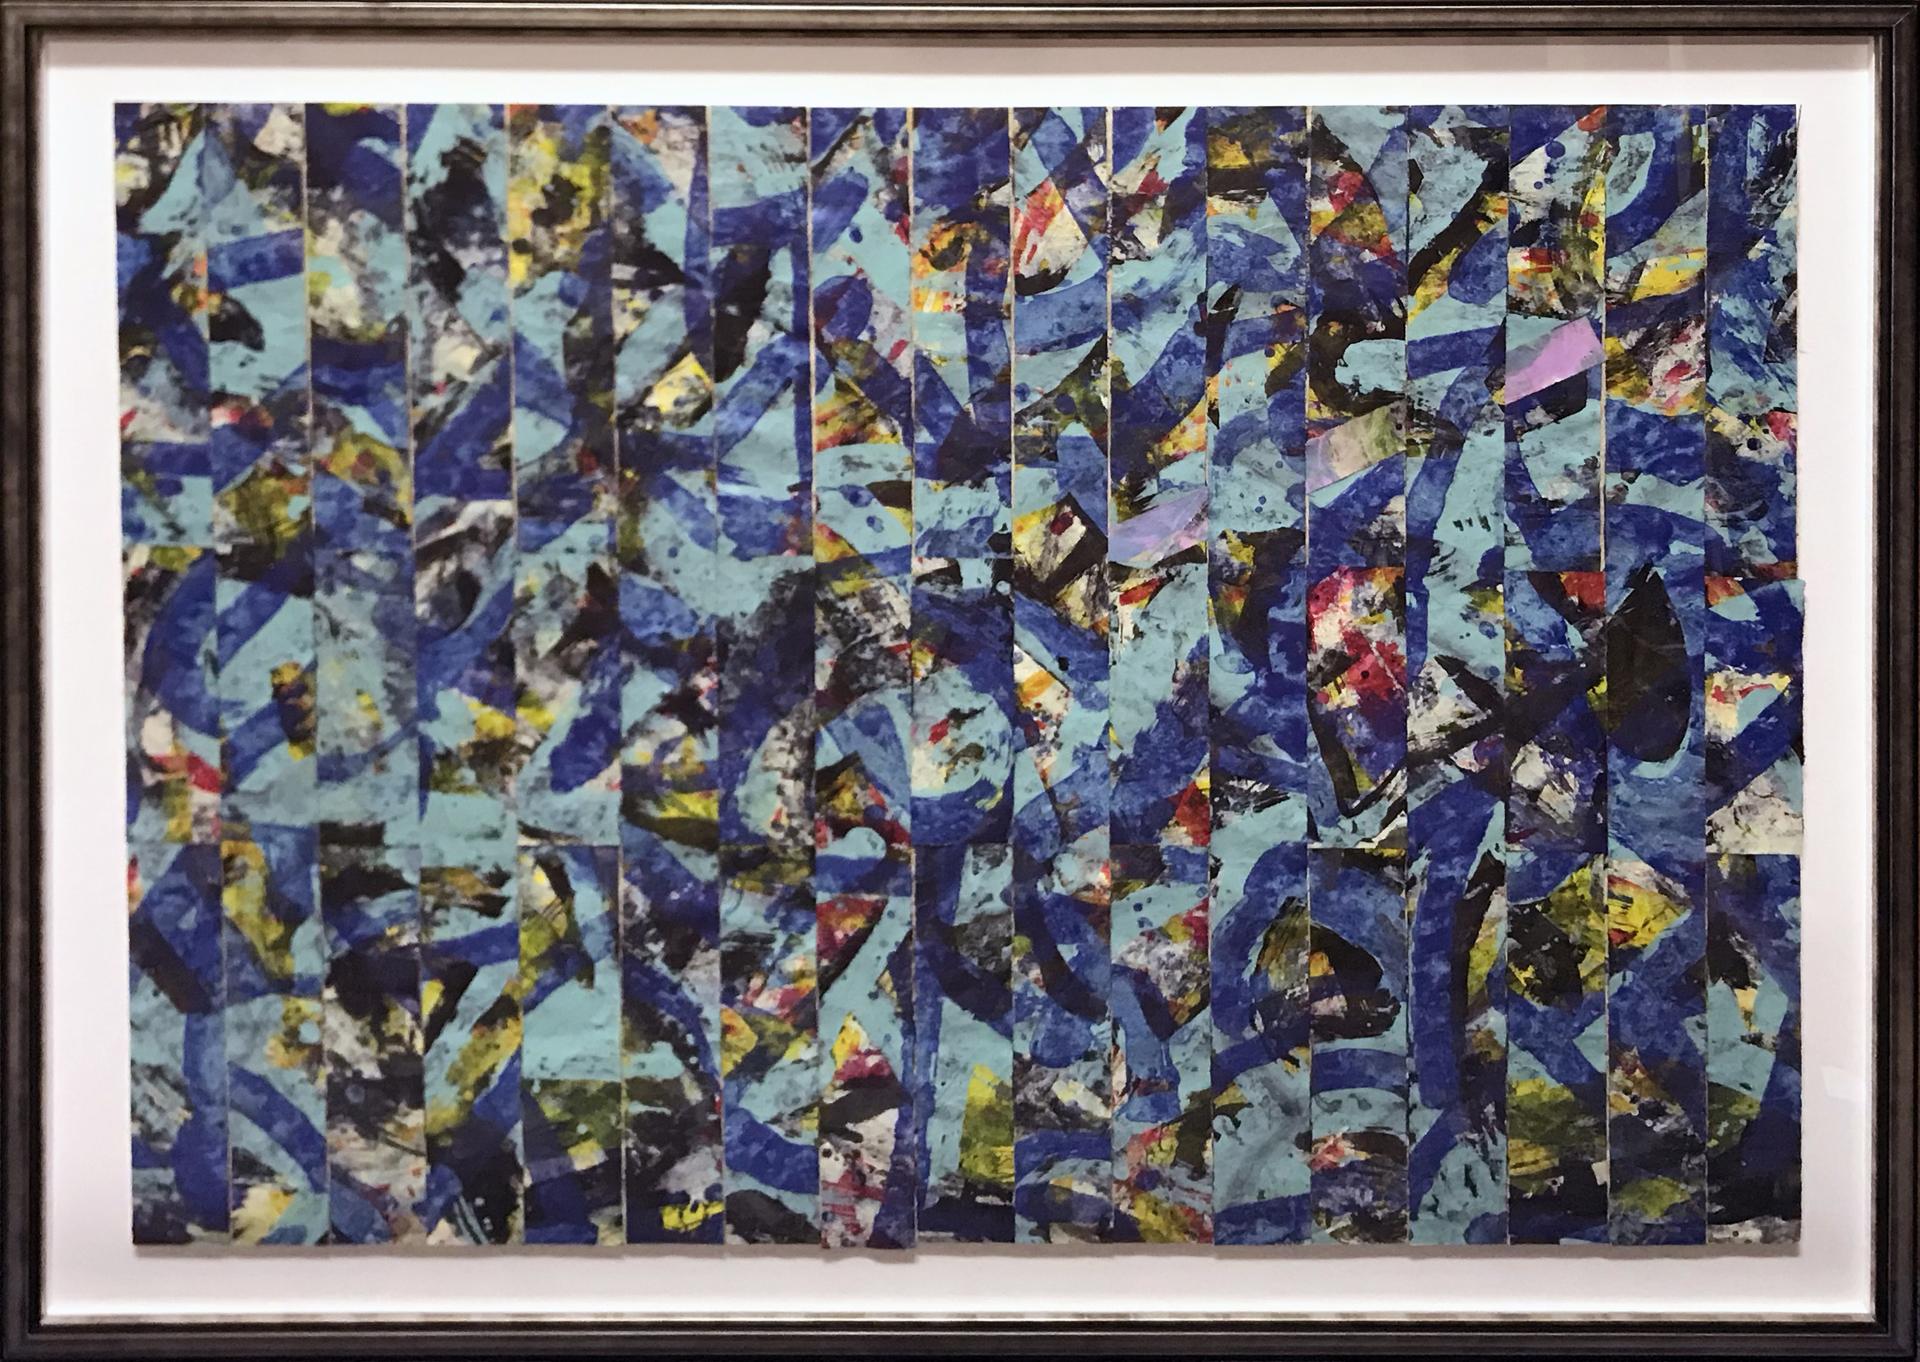 Turquoise Memories by Ibsen Espada